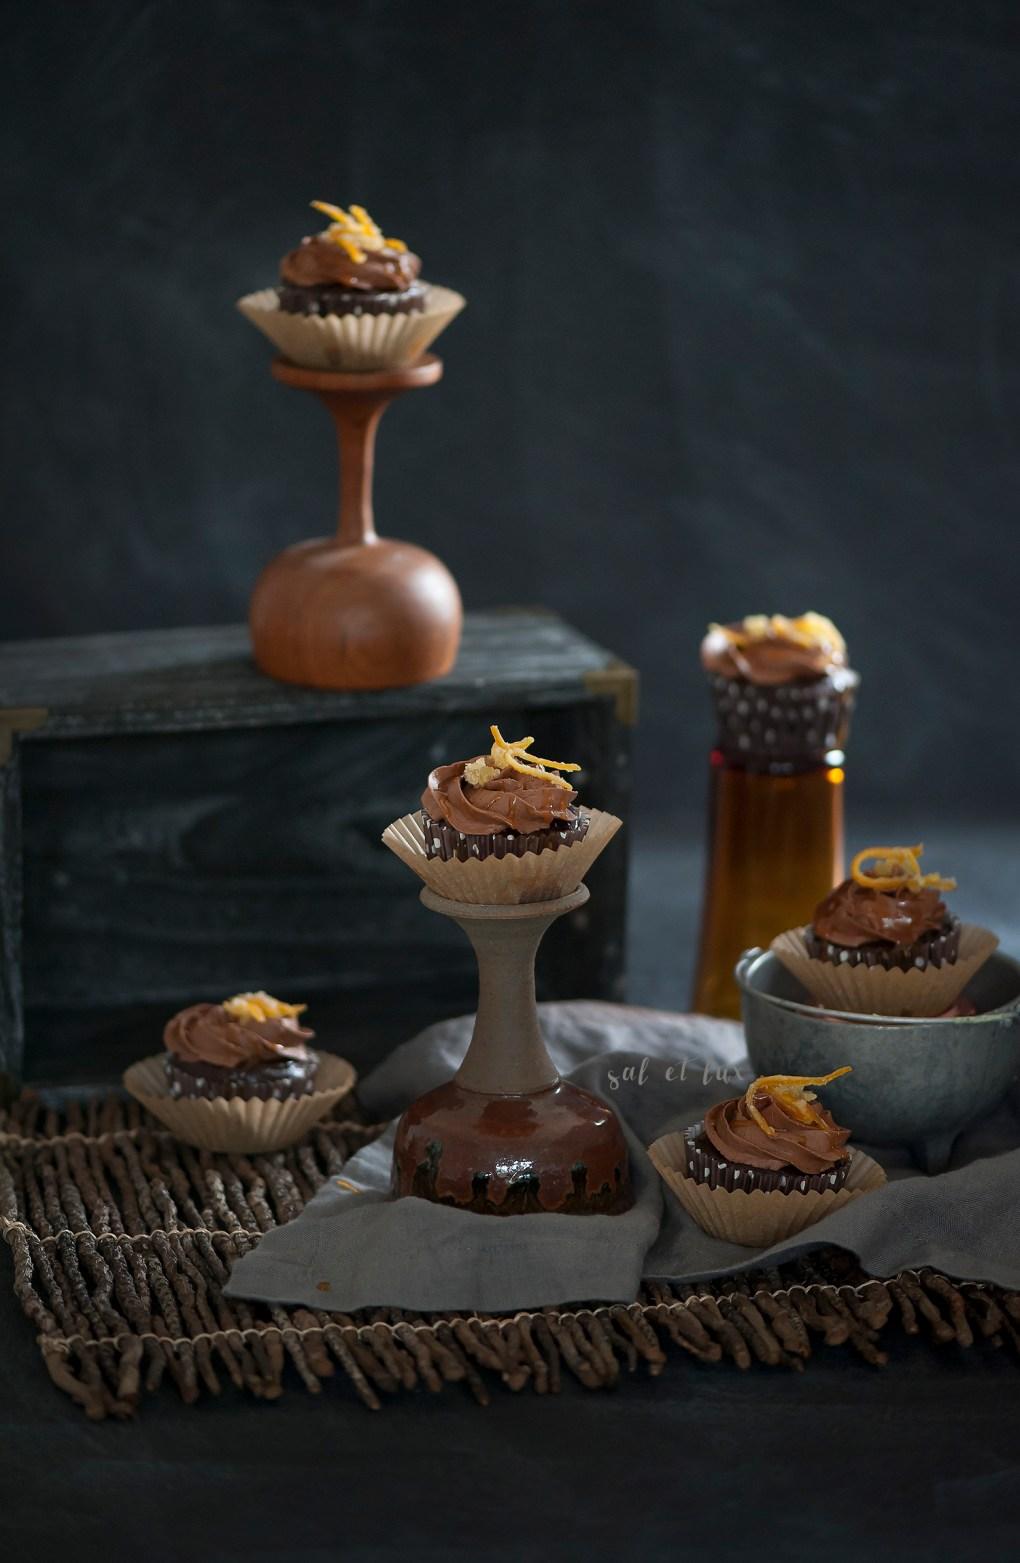 wicked-dark-chocolate-flourless-cakes-angela-sackett